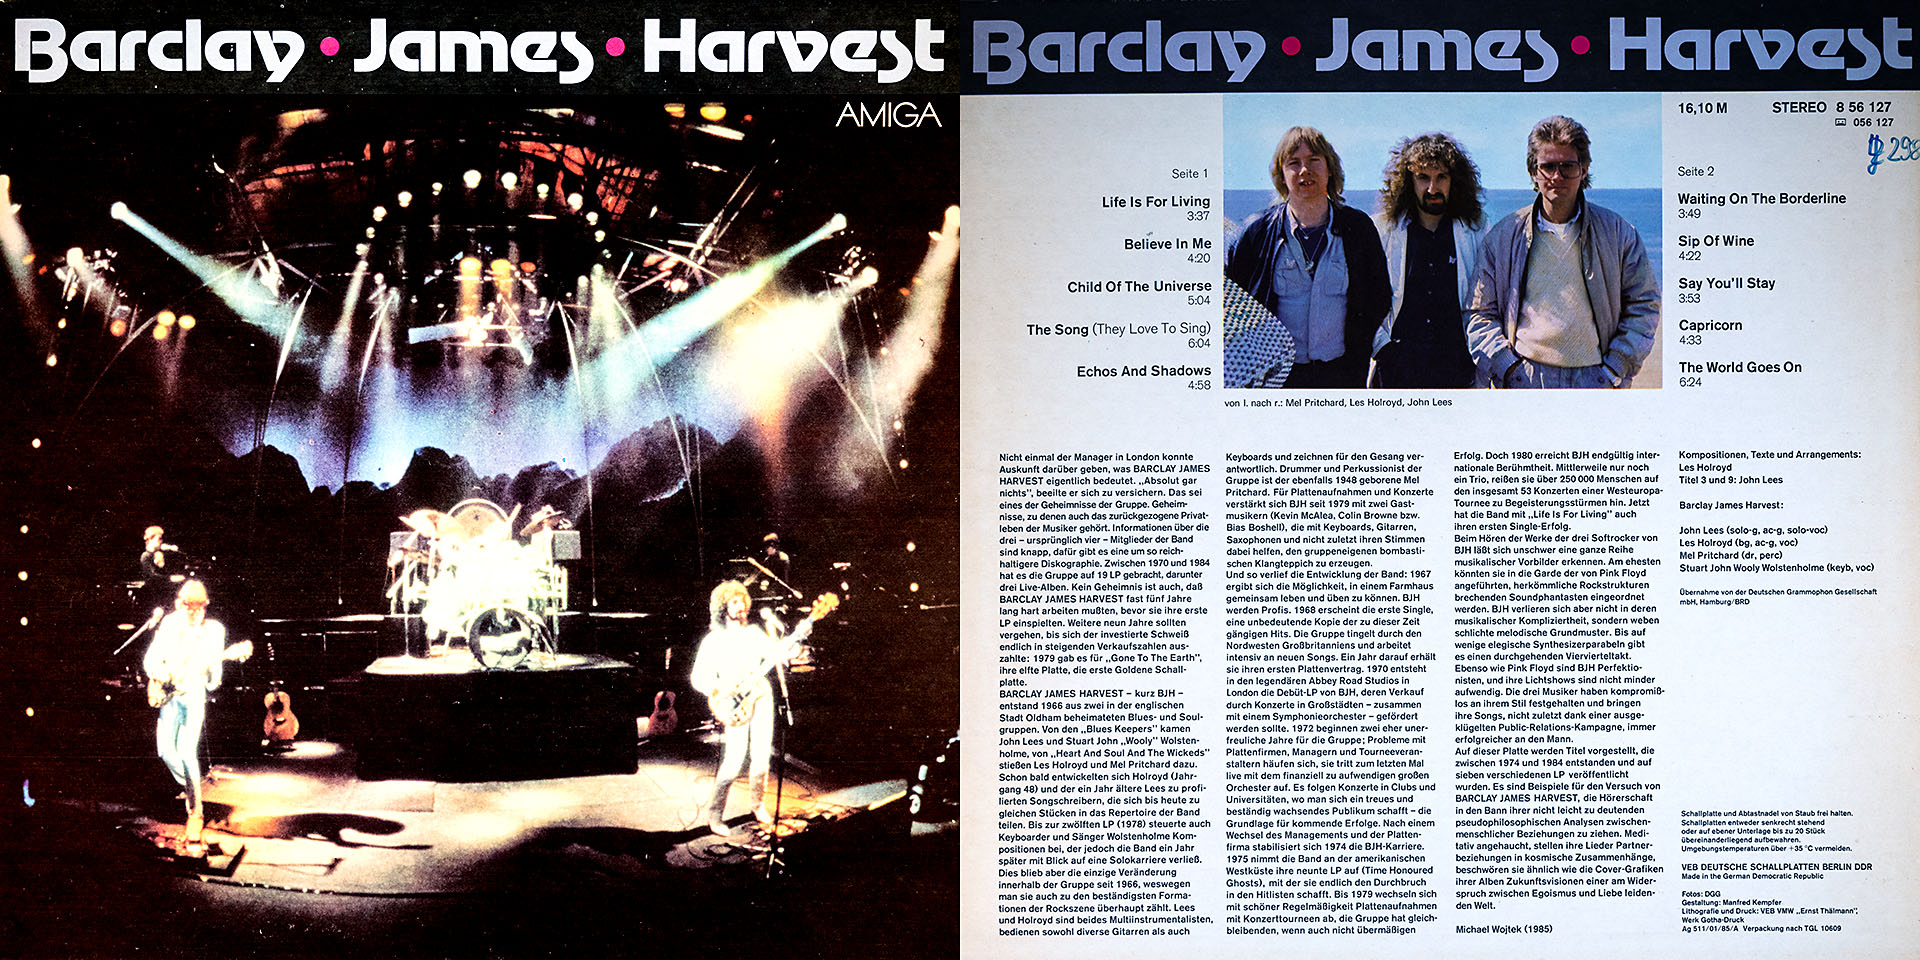 Barclay - James - Harvest - Barclay - James - Harvest